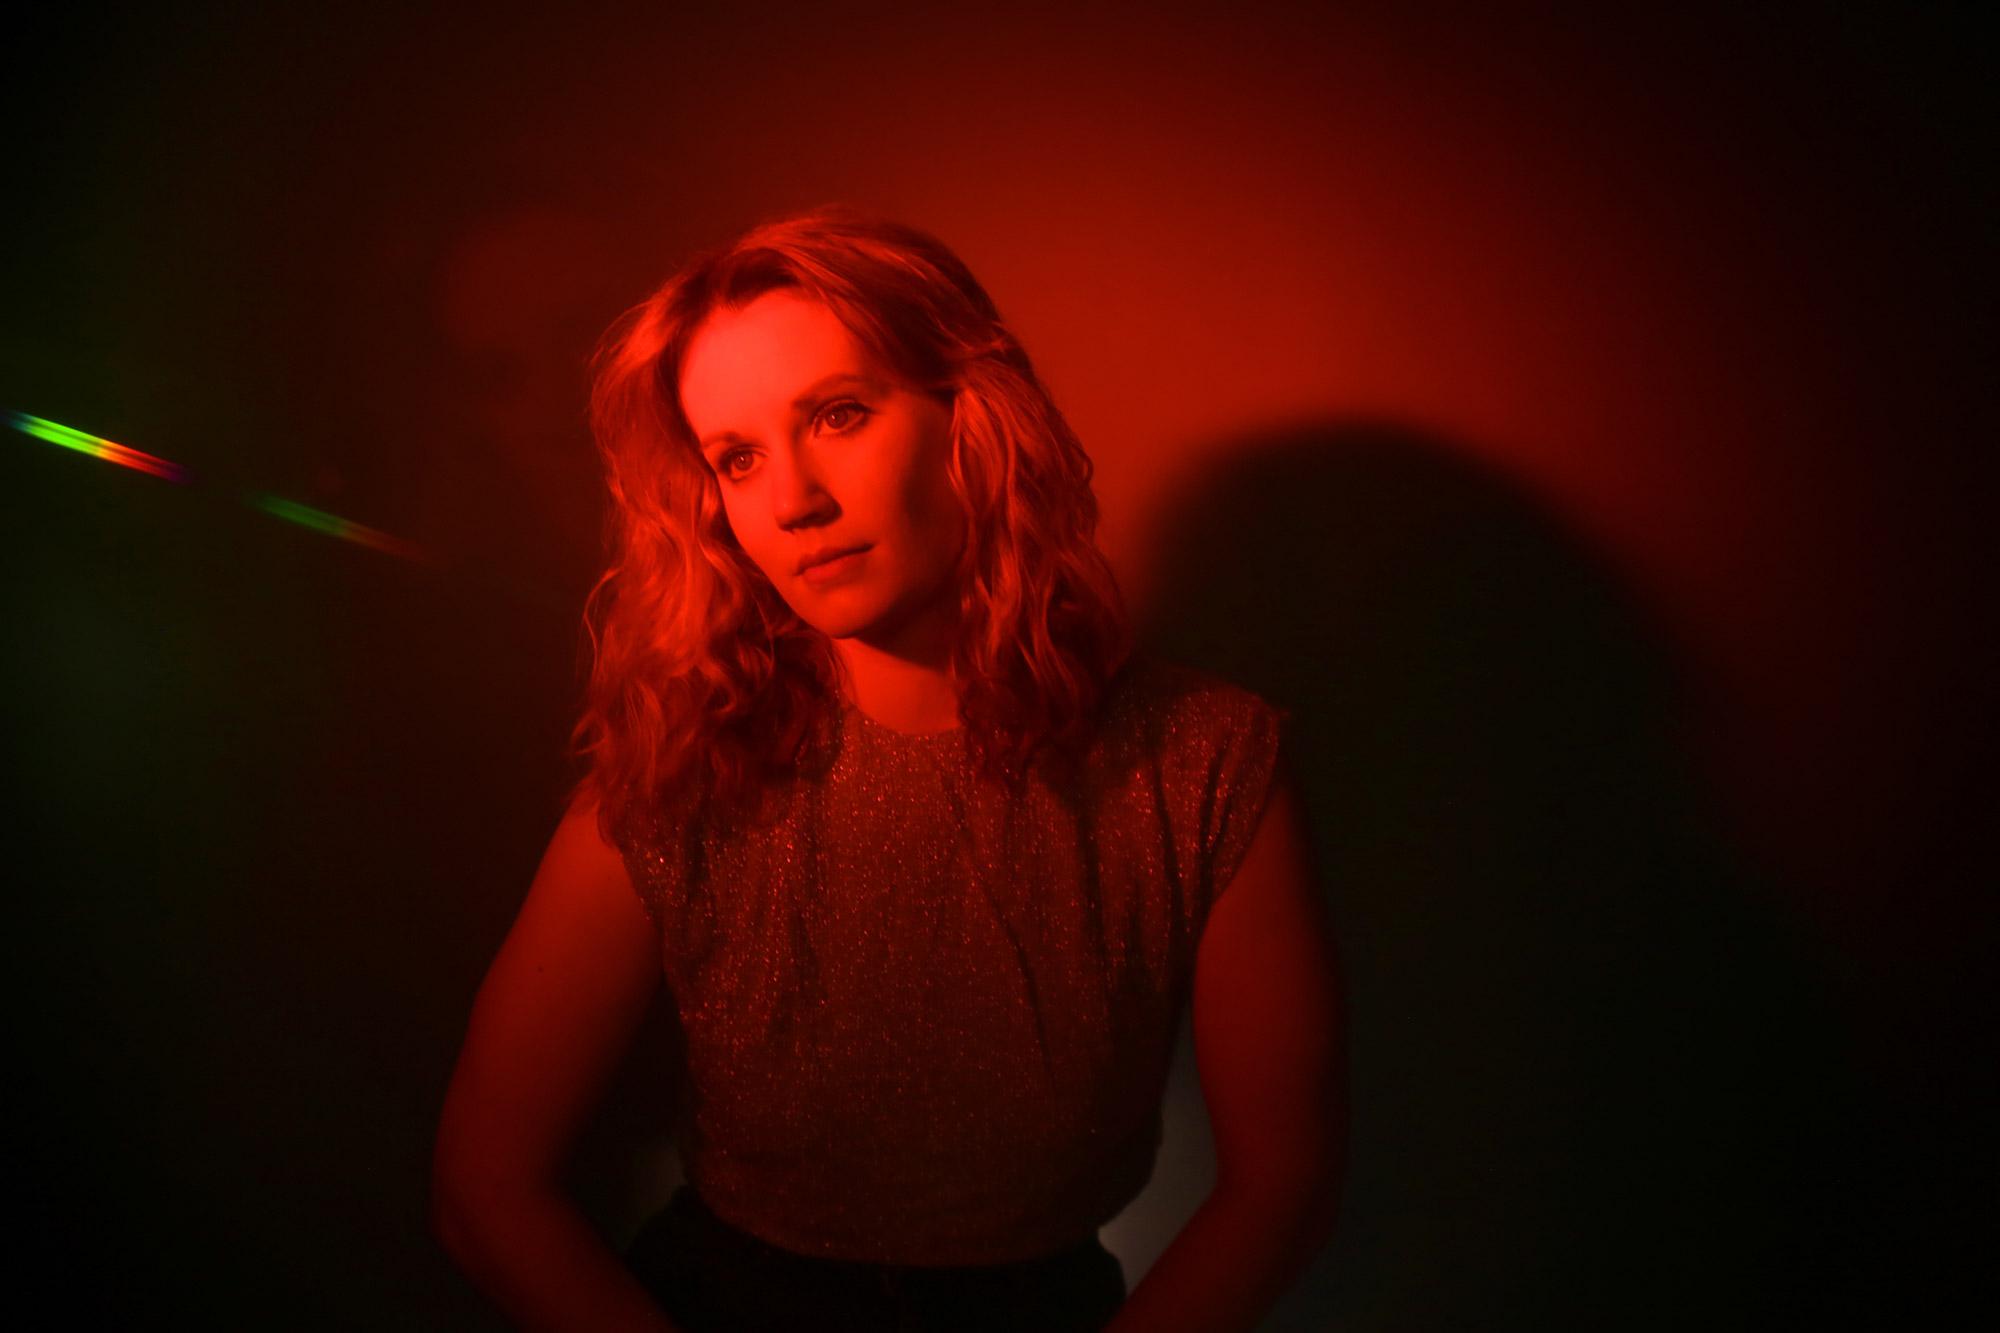 Gillian Todd